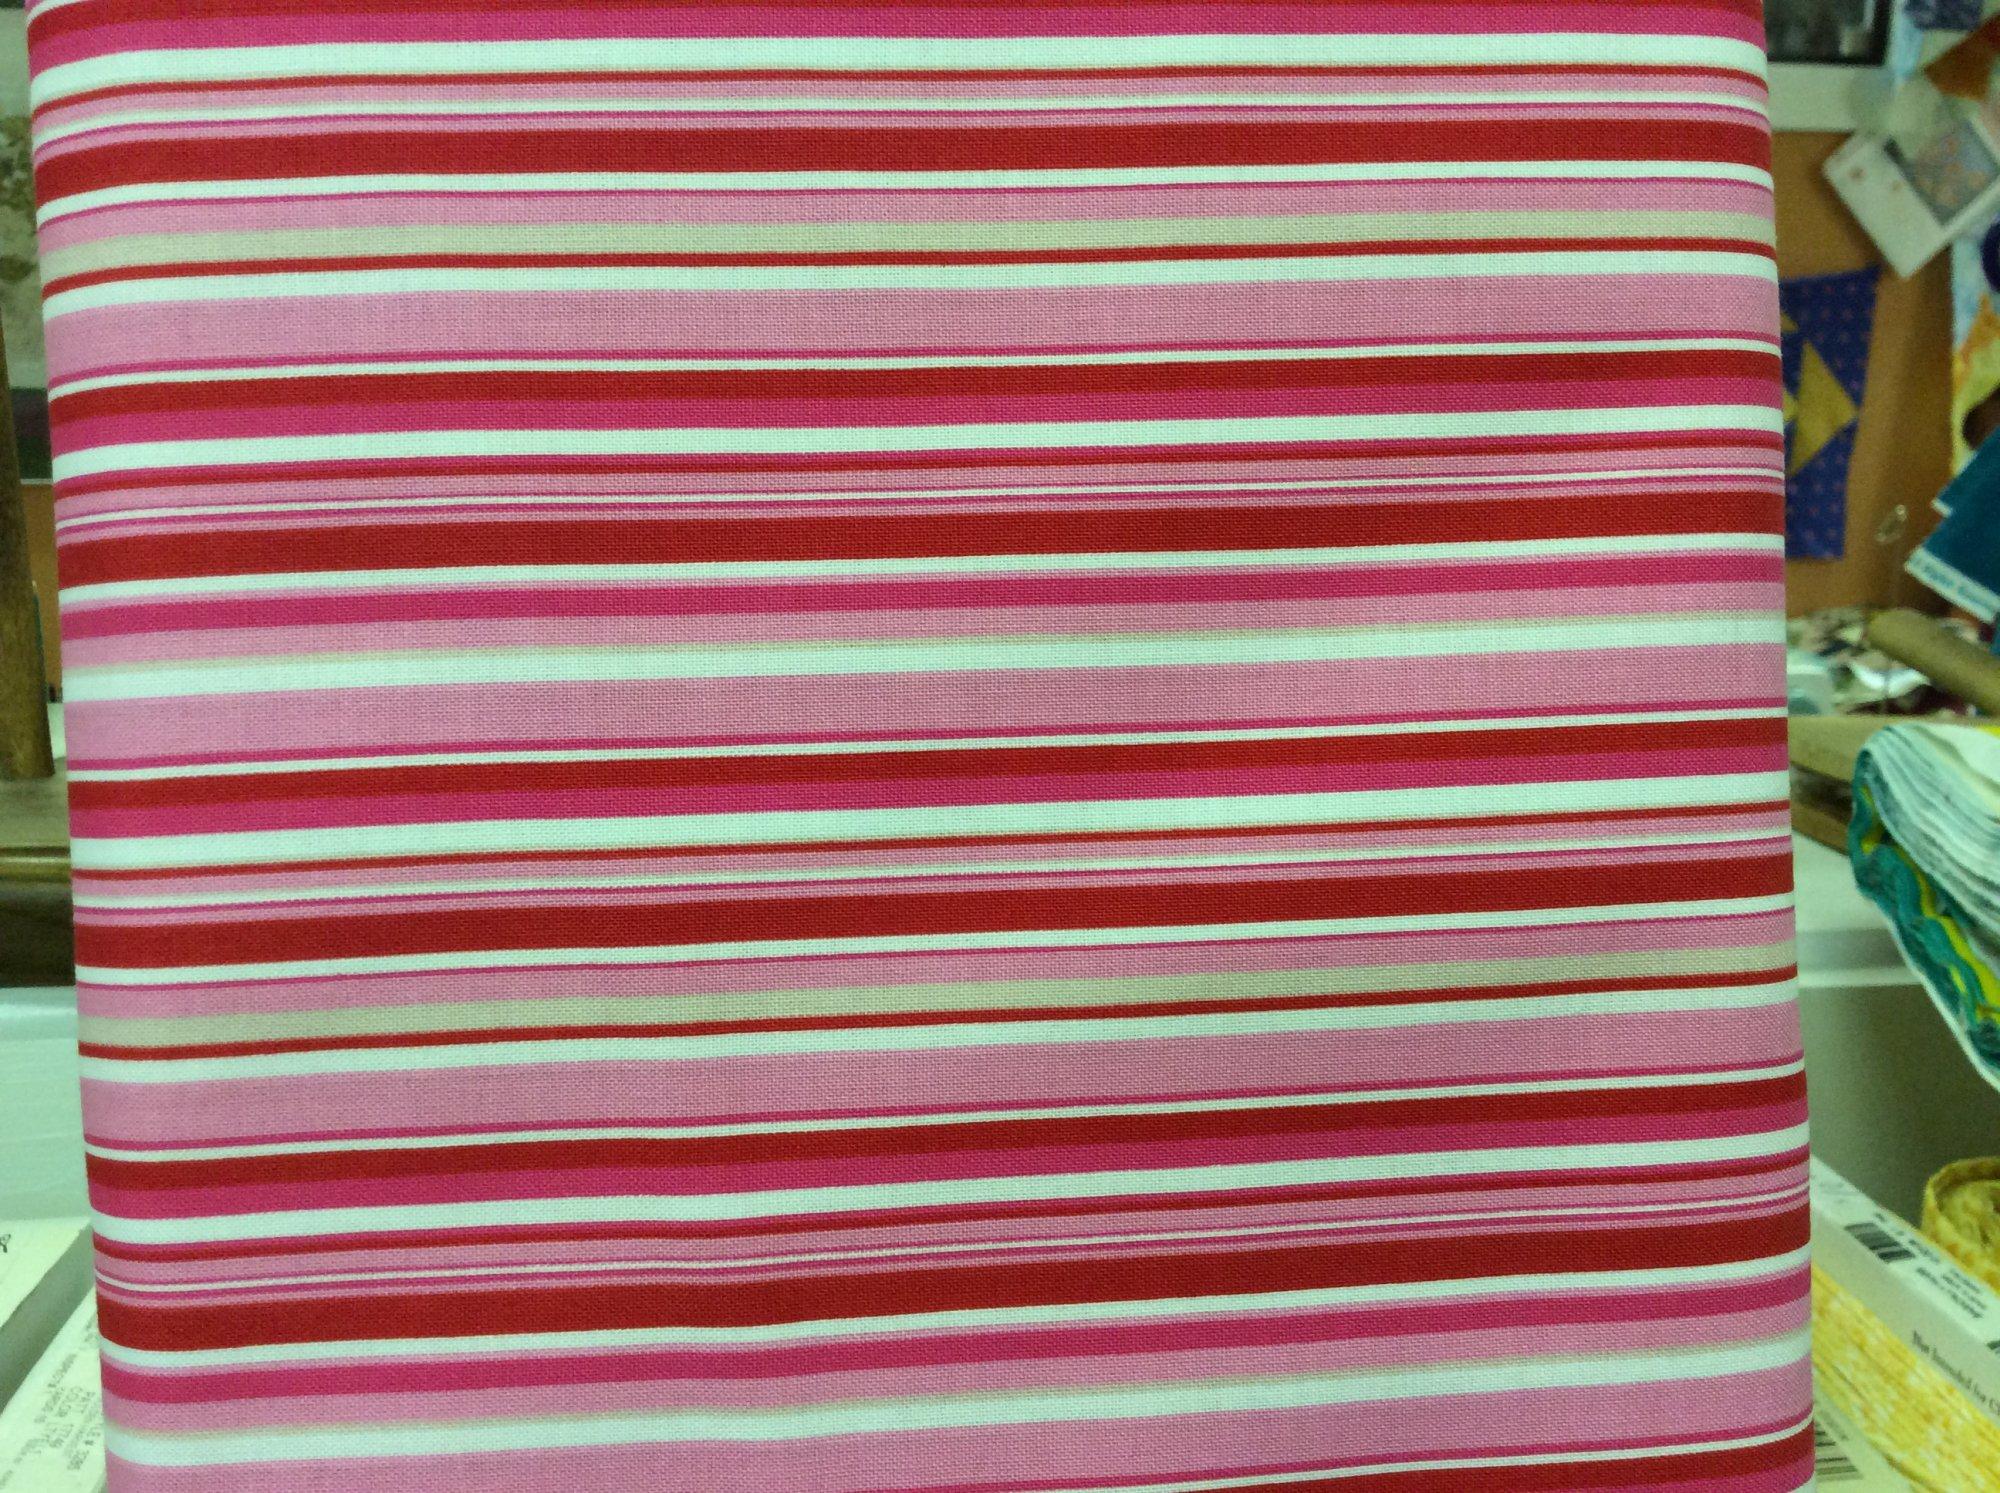 Contemporary Charm- stripes